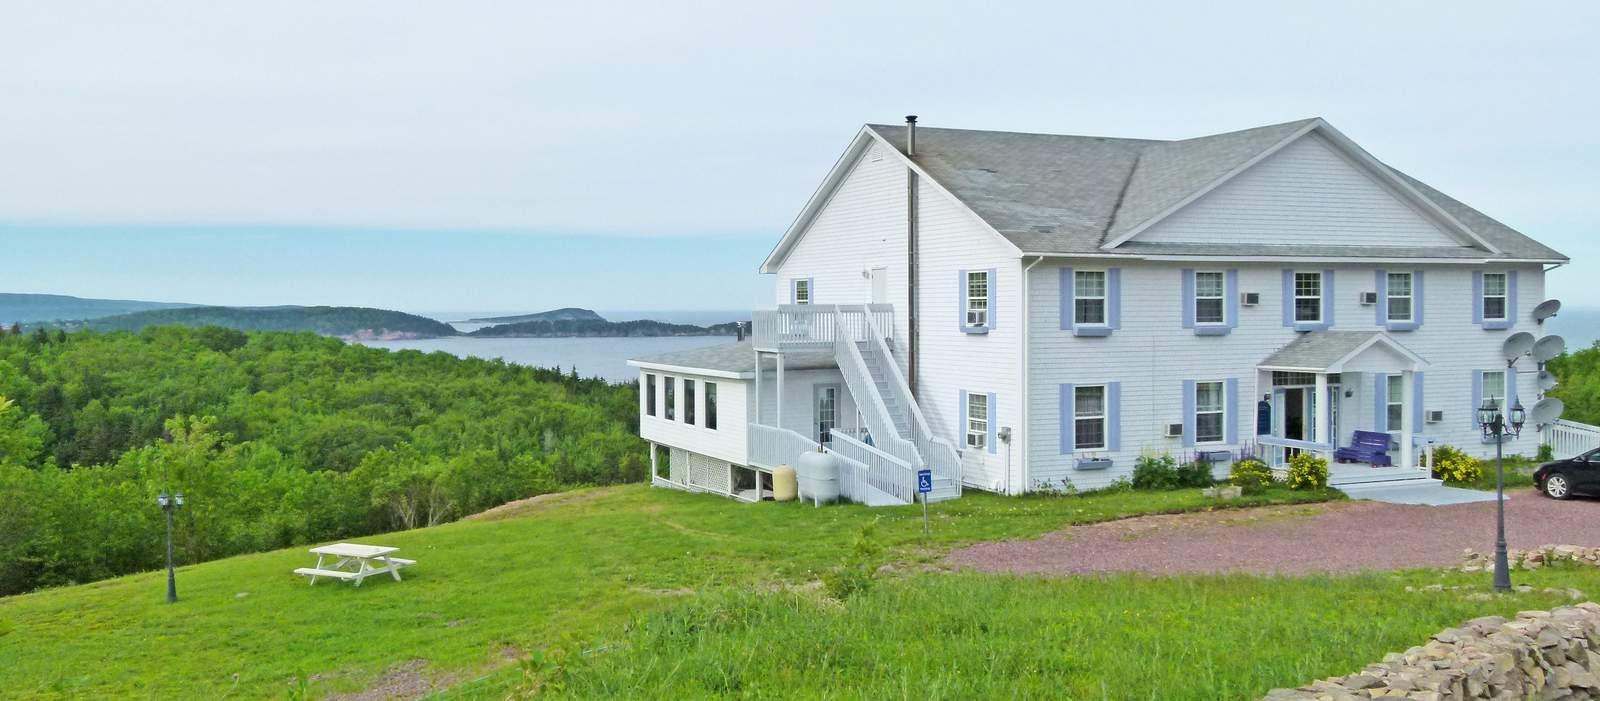 Aussenansicht mit Meeresblick des Castle Rock Country Inn